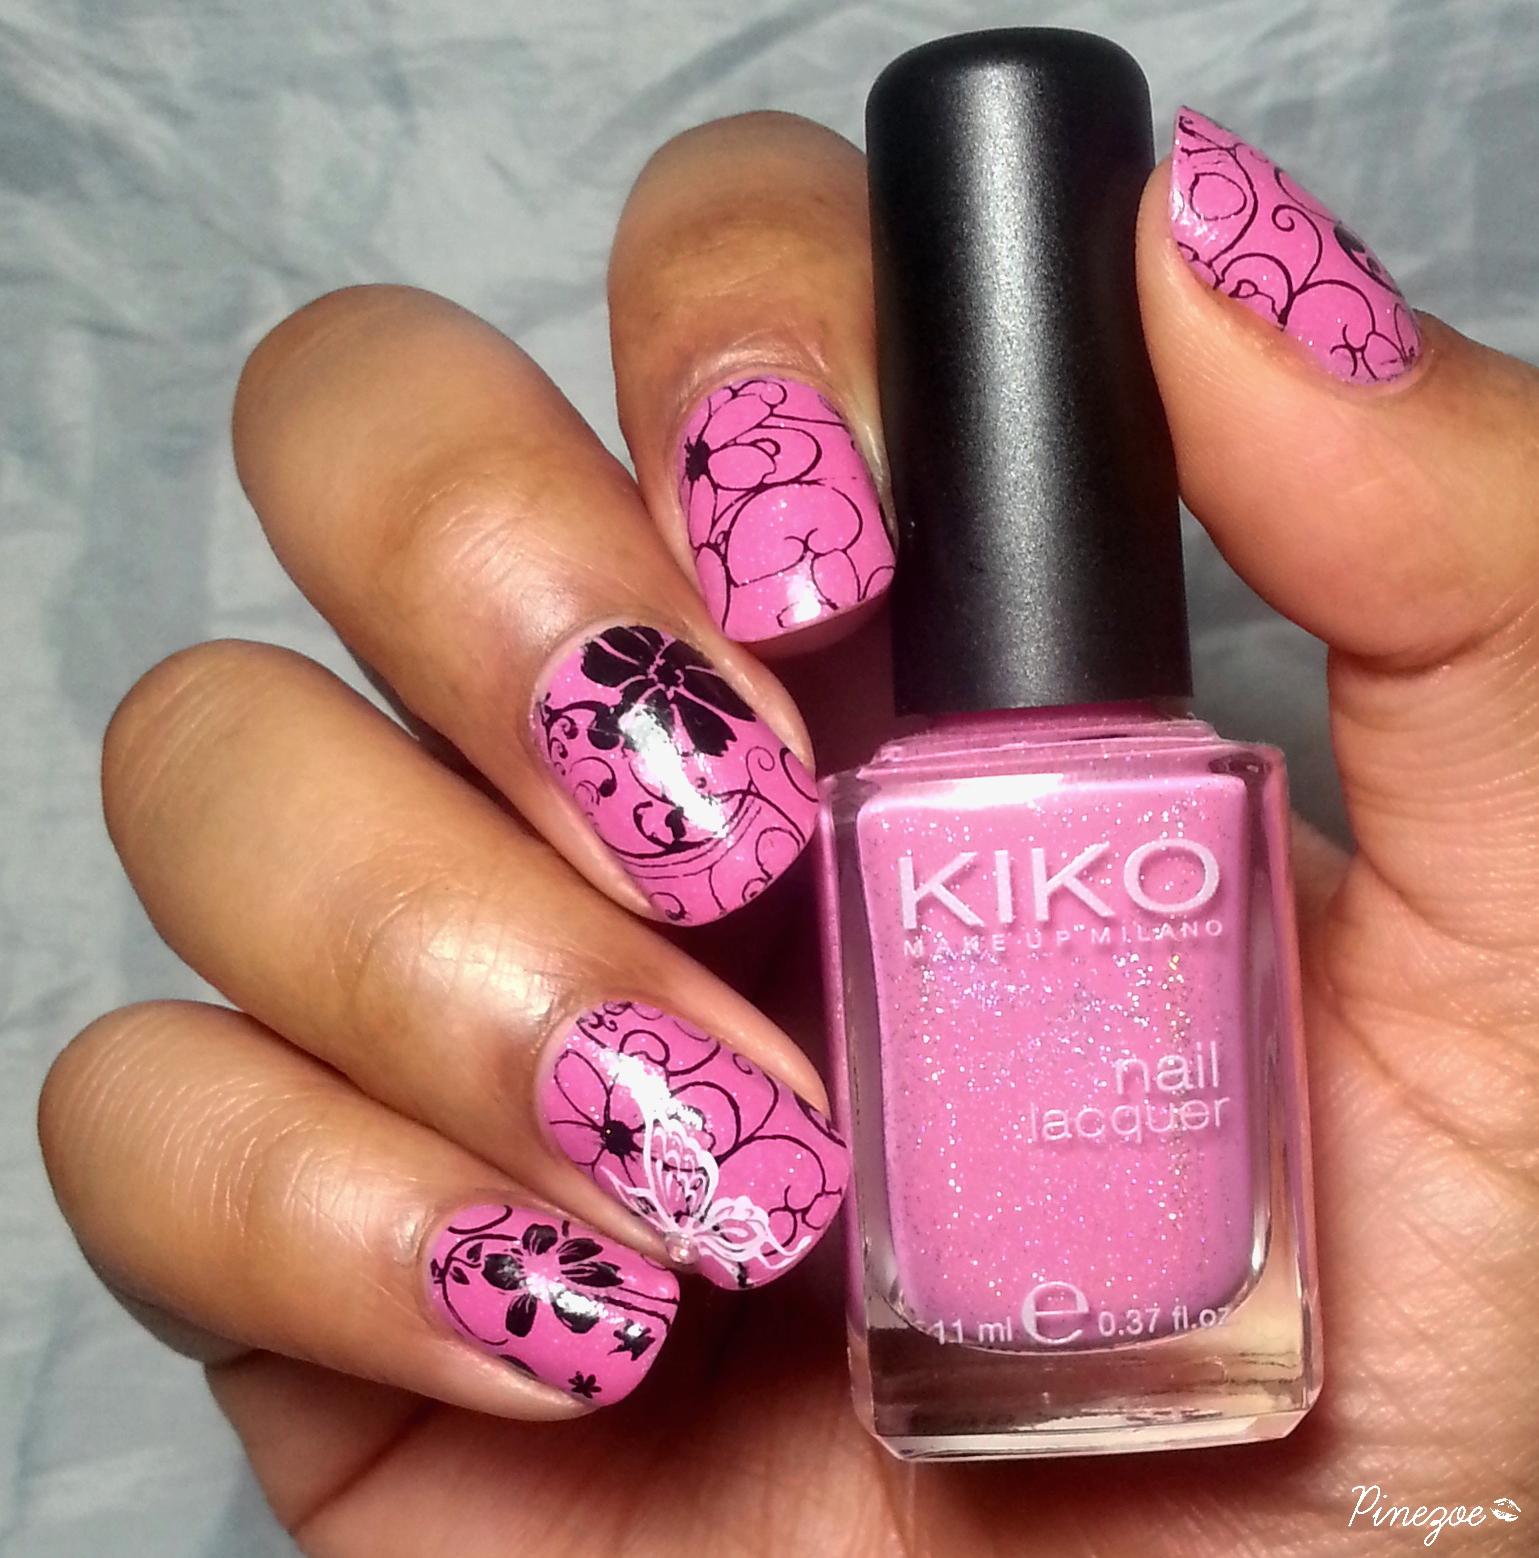 Kiko 505 & Stamping BP 24